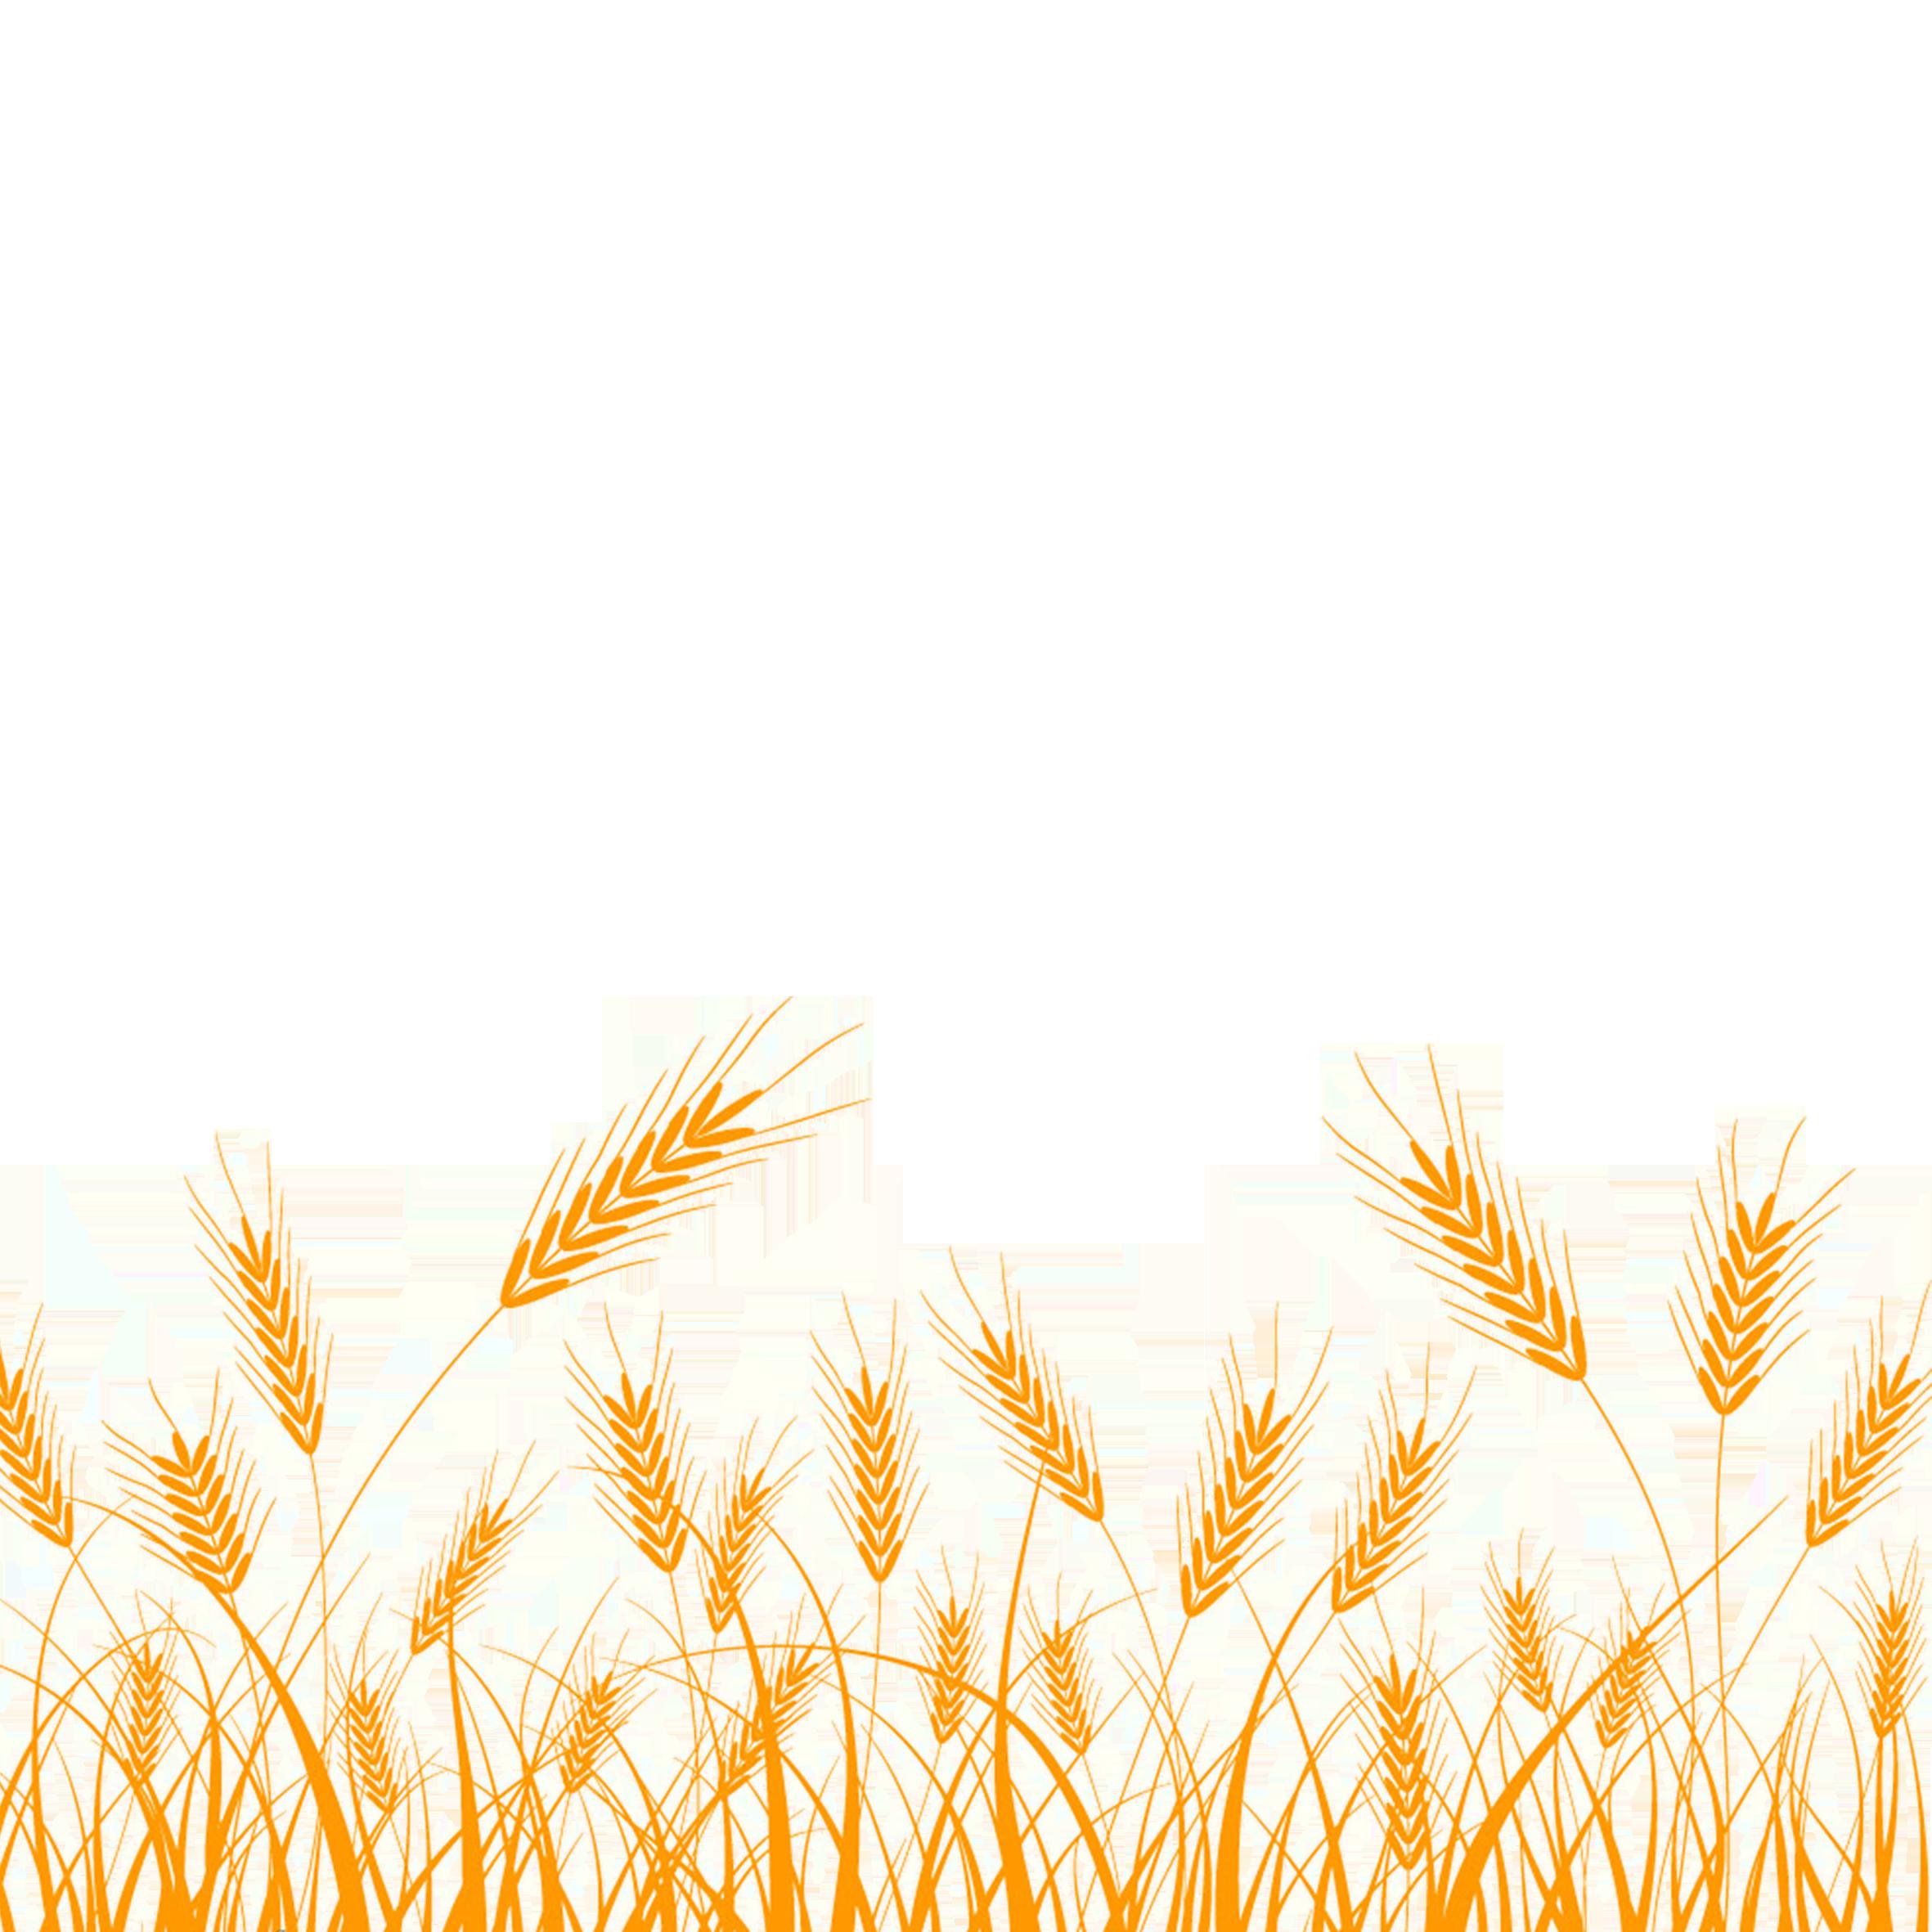 Wheat Silhouette Clip art.